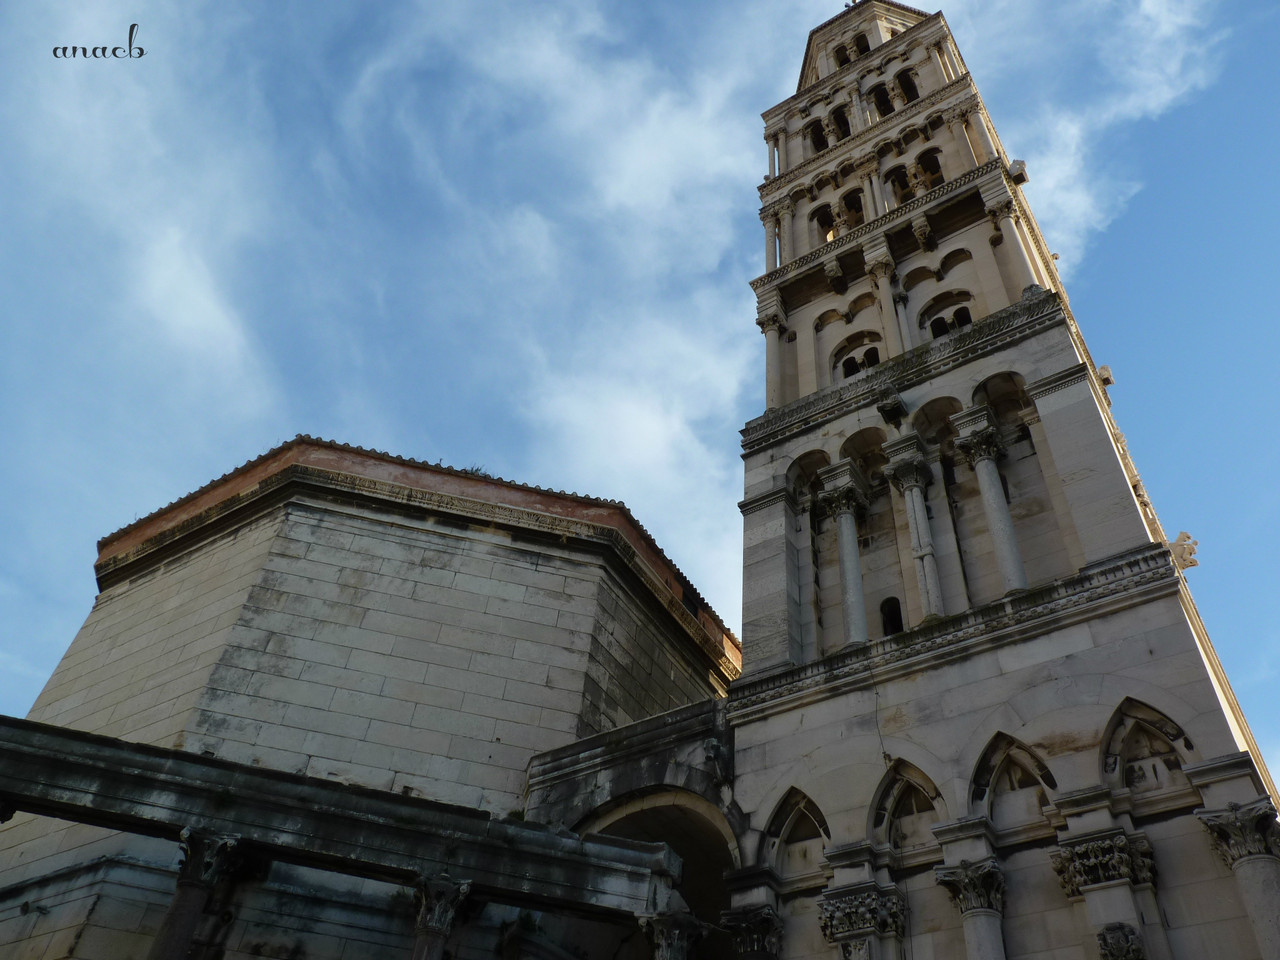 Croácia-Split-Torre e Catedral 2.jpg